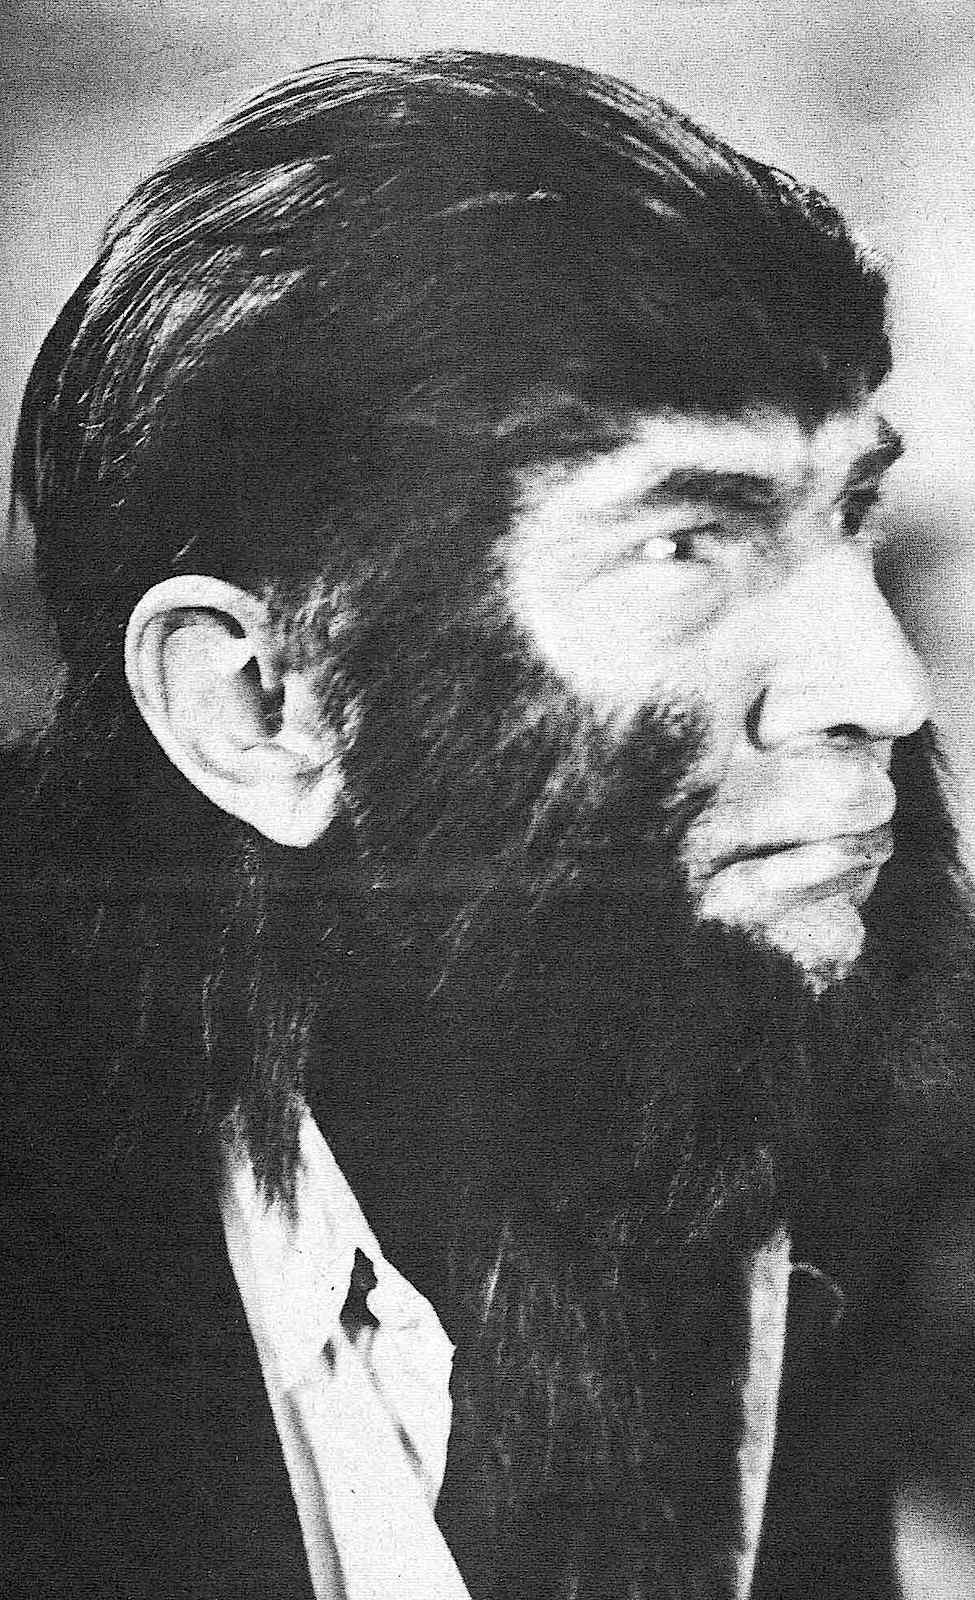 Hollywood monster, dapper gentleman wolfman